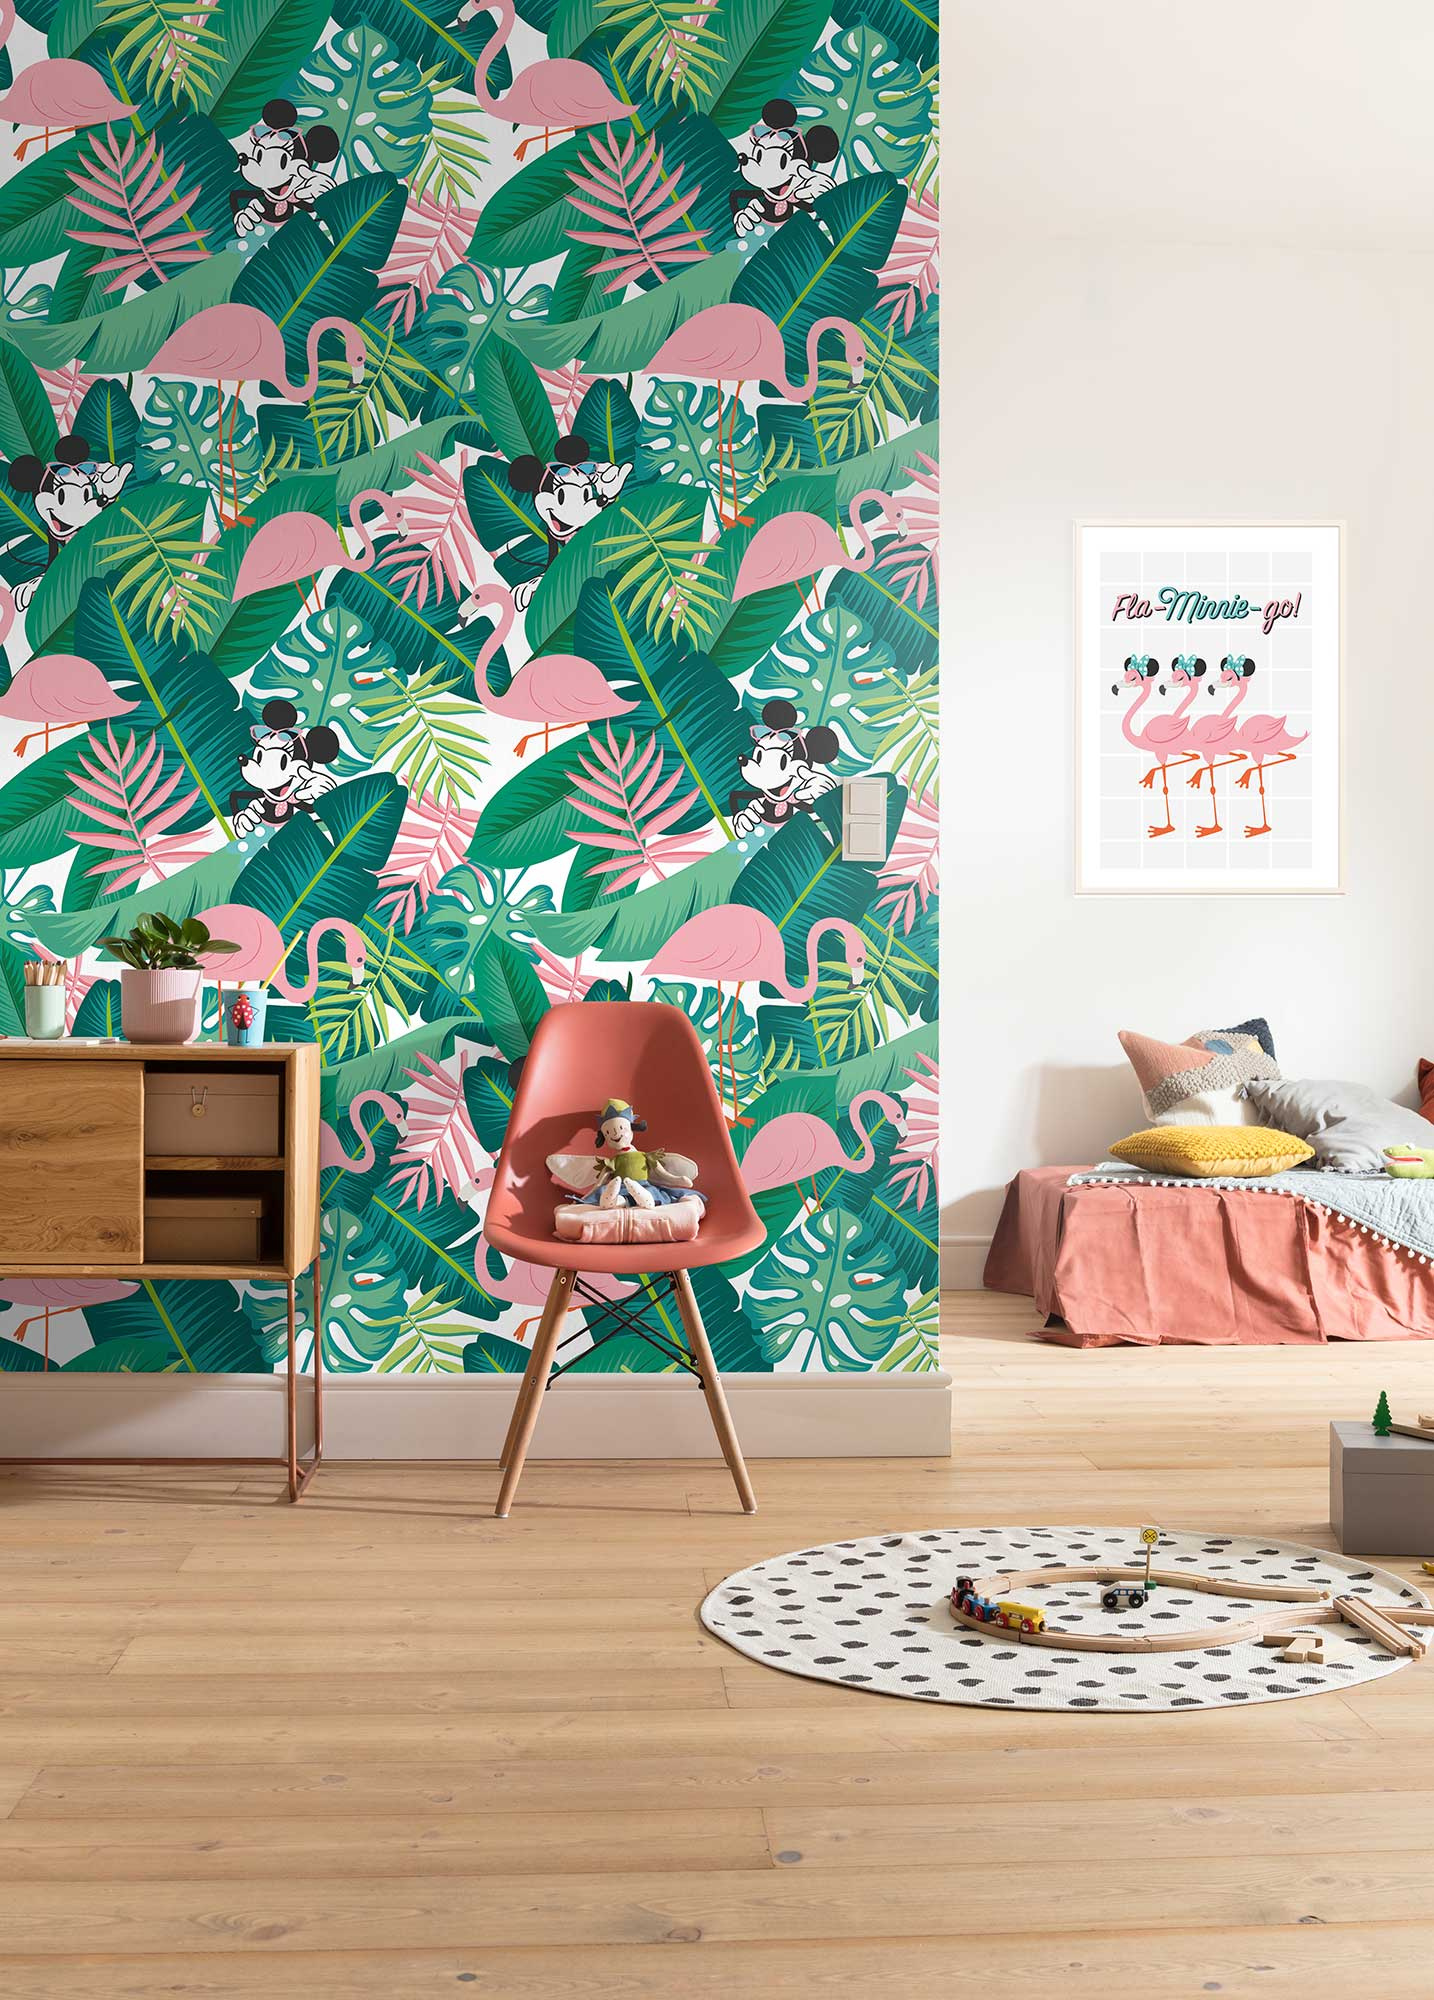 Disney Edition 4 Kinderbehang Komar - Kinderkamer behang Minnie Tropical eingeschweißt